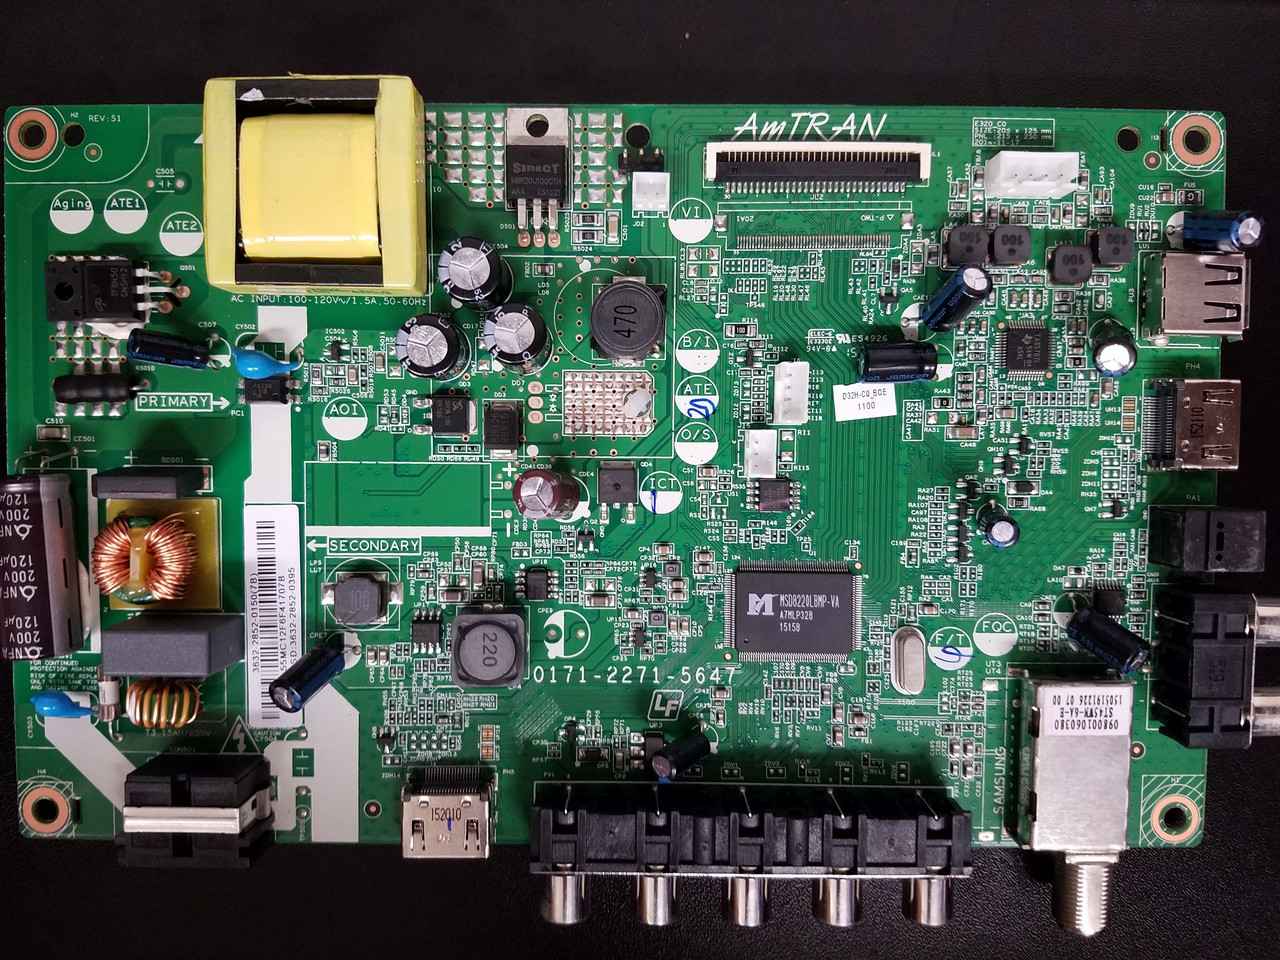 Vizio 3632-2852-0150 Main Board / Power Supply for D32H-C0